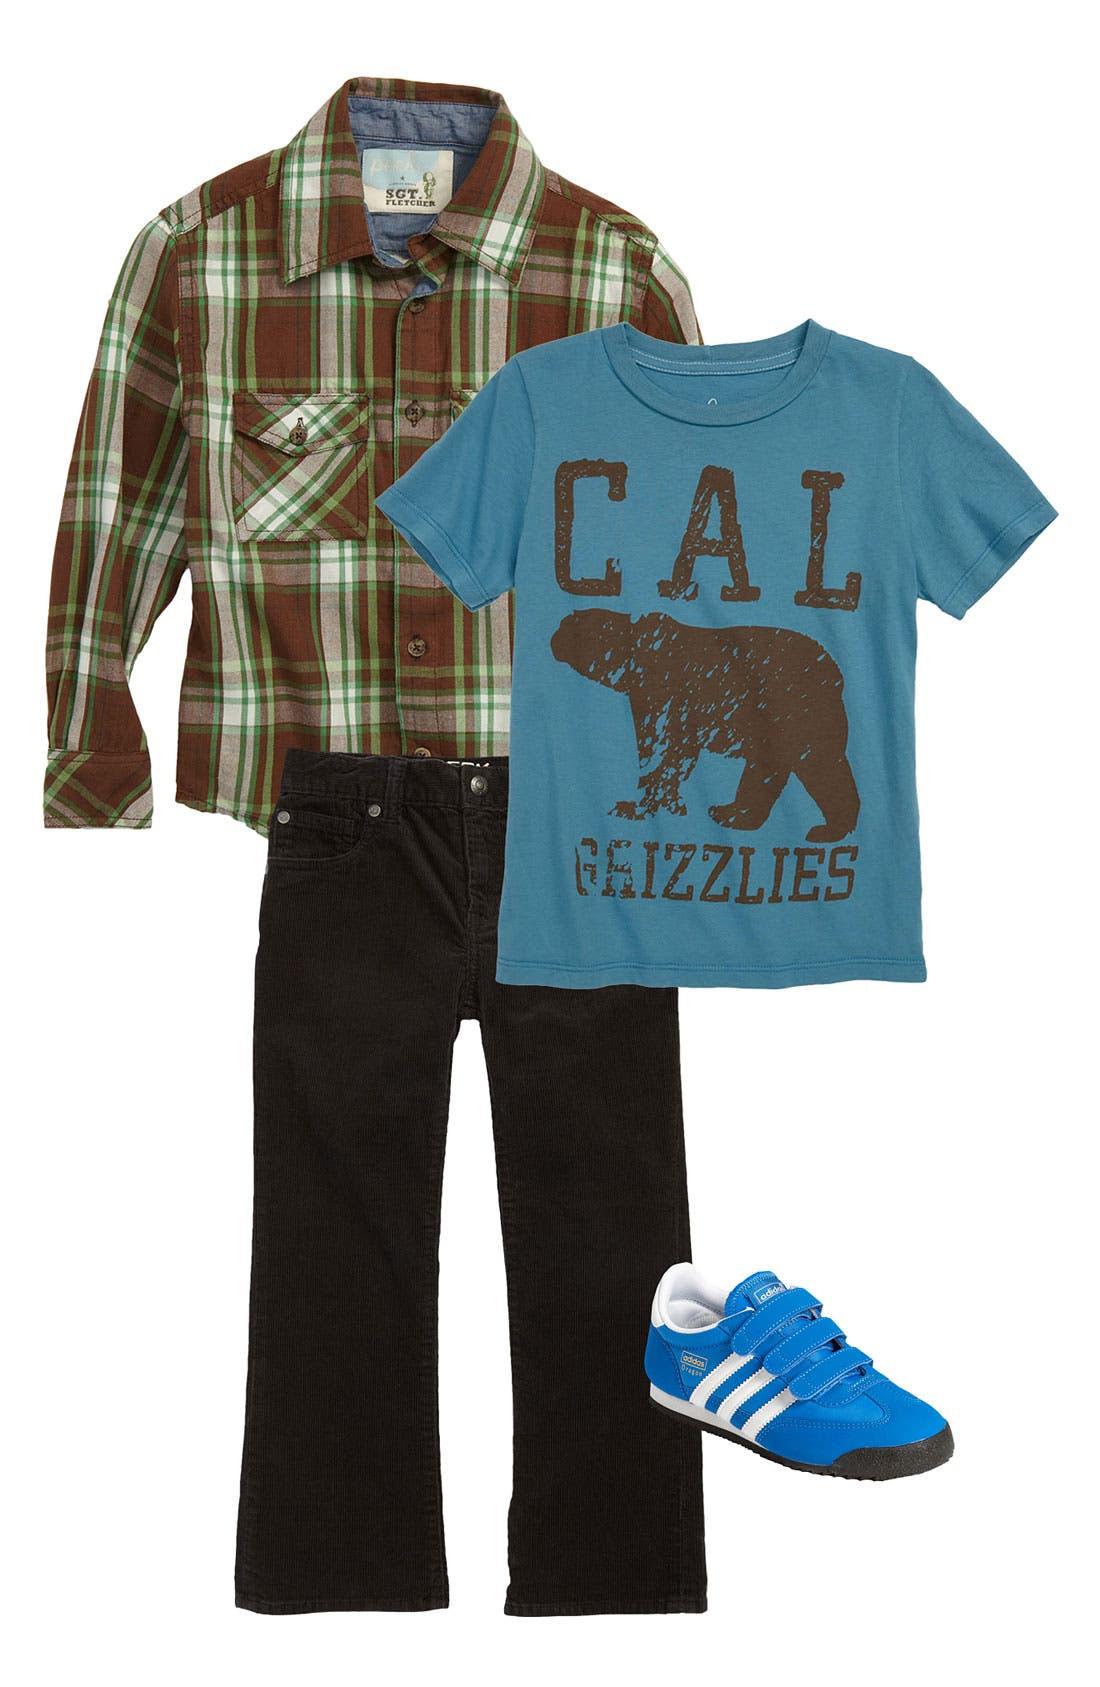 Alternate Image 1 Selected - Peek T-Shirt, Plaid Shirt & Jeans (Toddler, Little Boys & Big Boys)